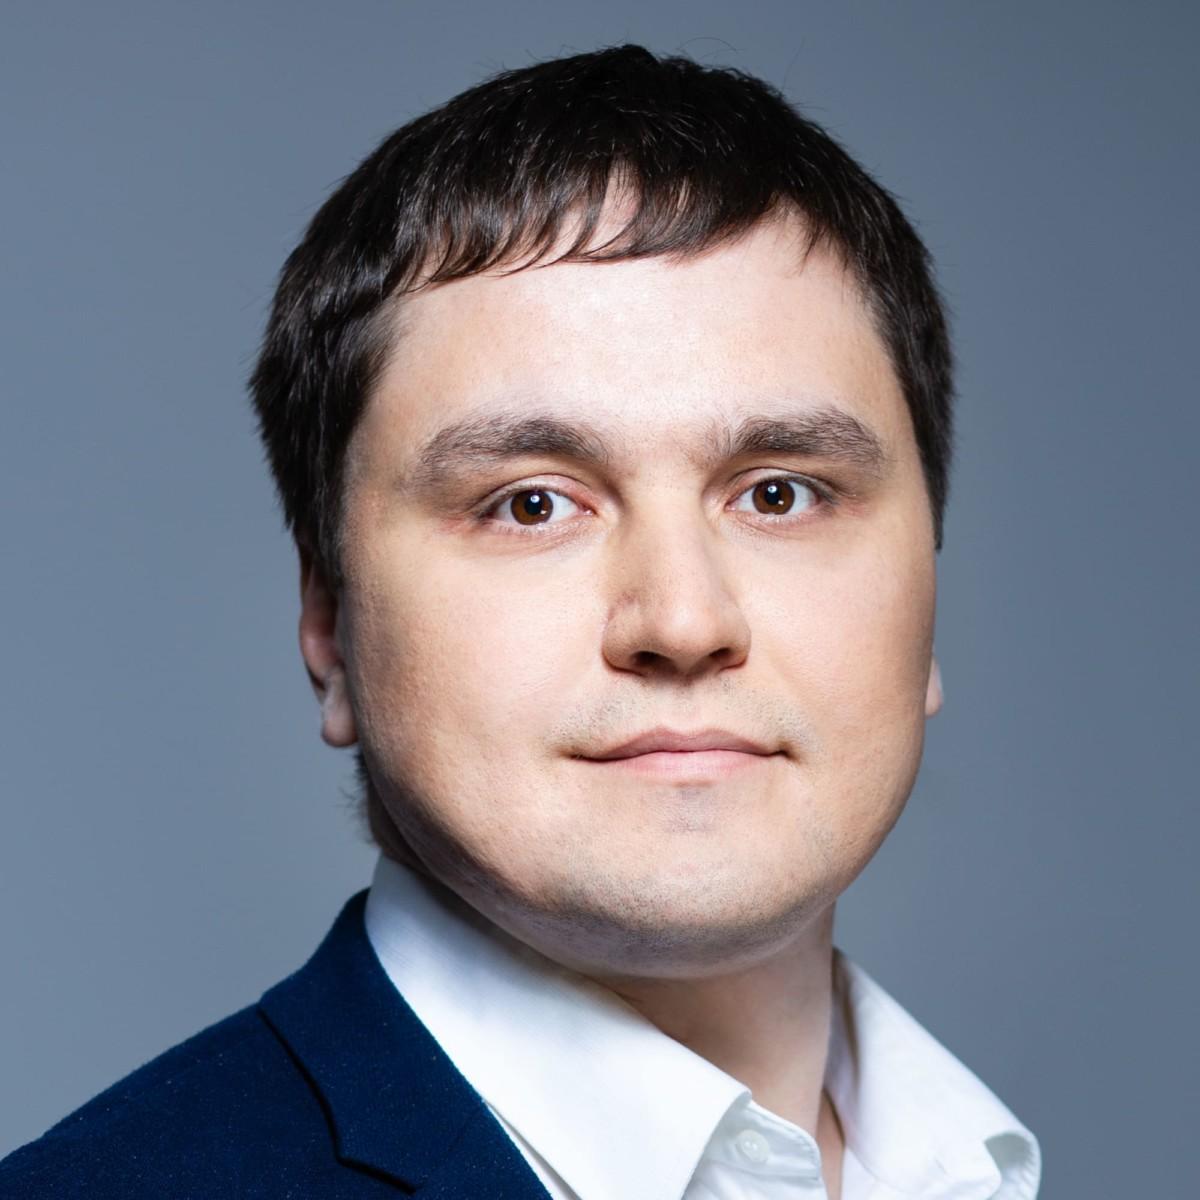 Alexey Petukhov